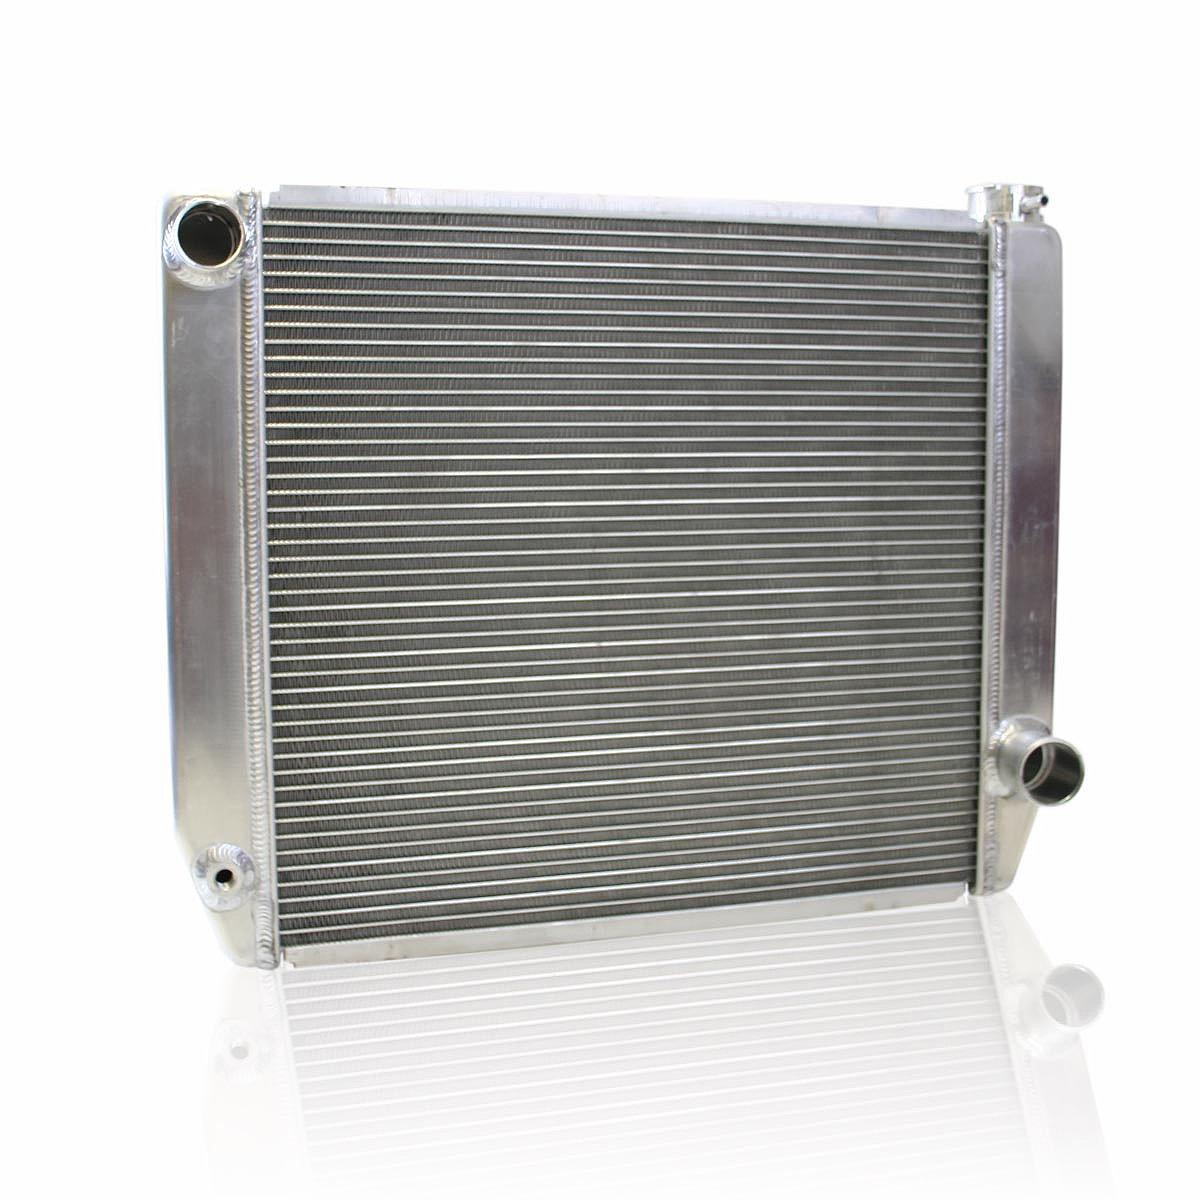 Griffin Radiator  1-25202-XS ClassicCool 24'' x 19'' 2-Row Universal Fit Cross Flow Radiator with 1'' Tube